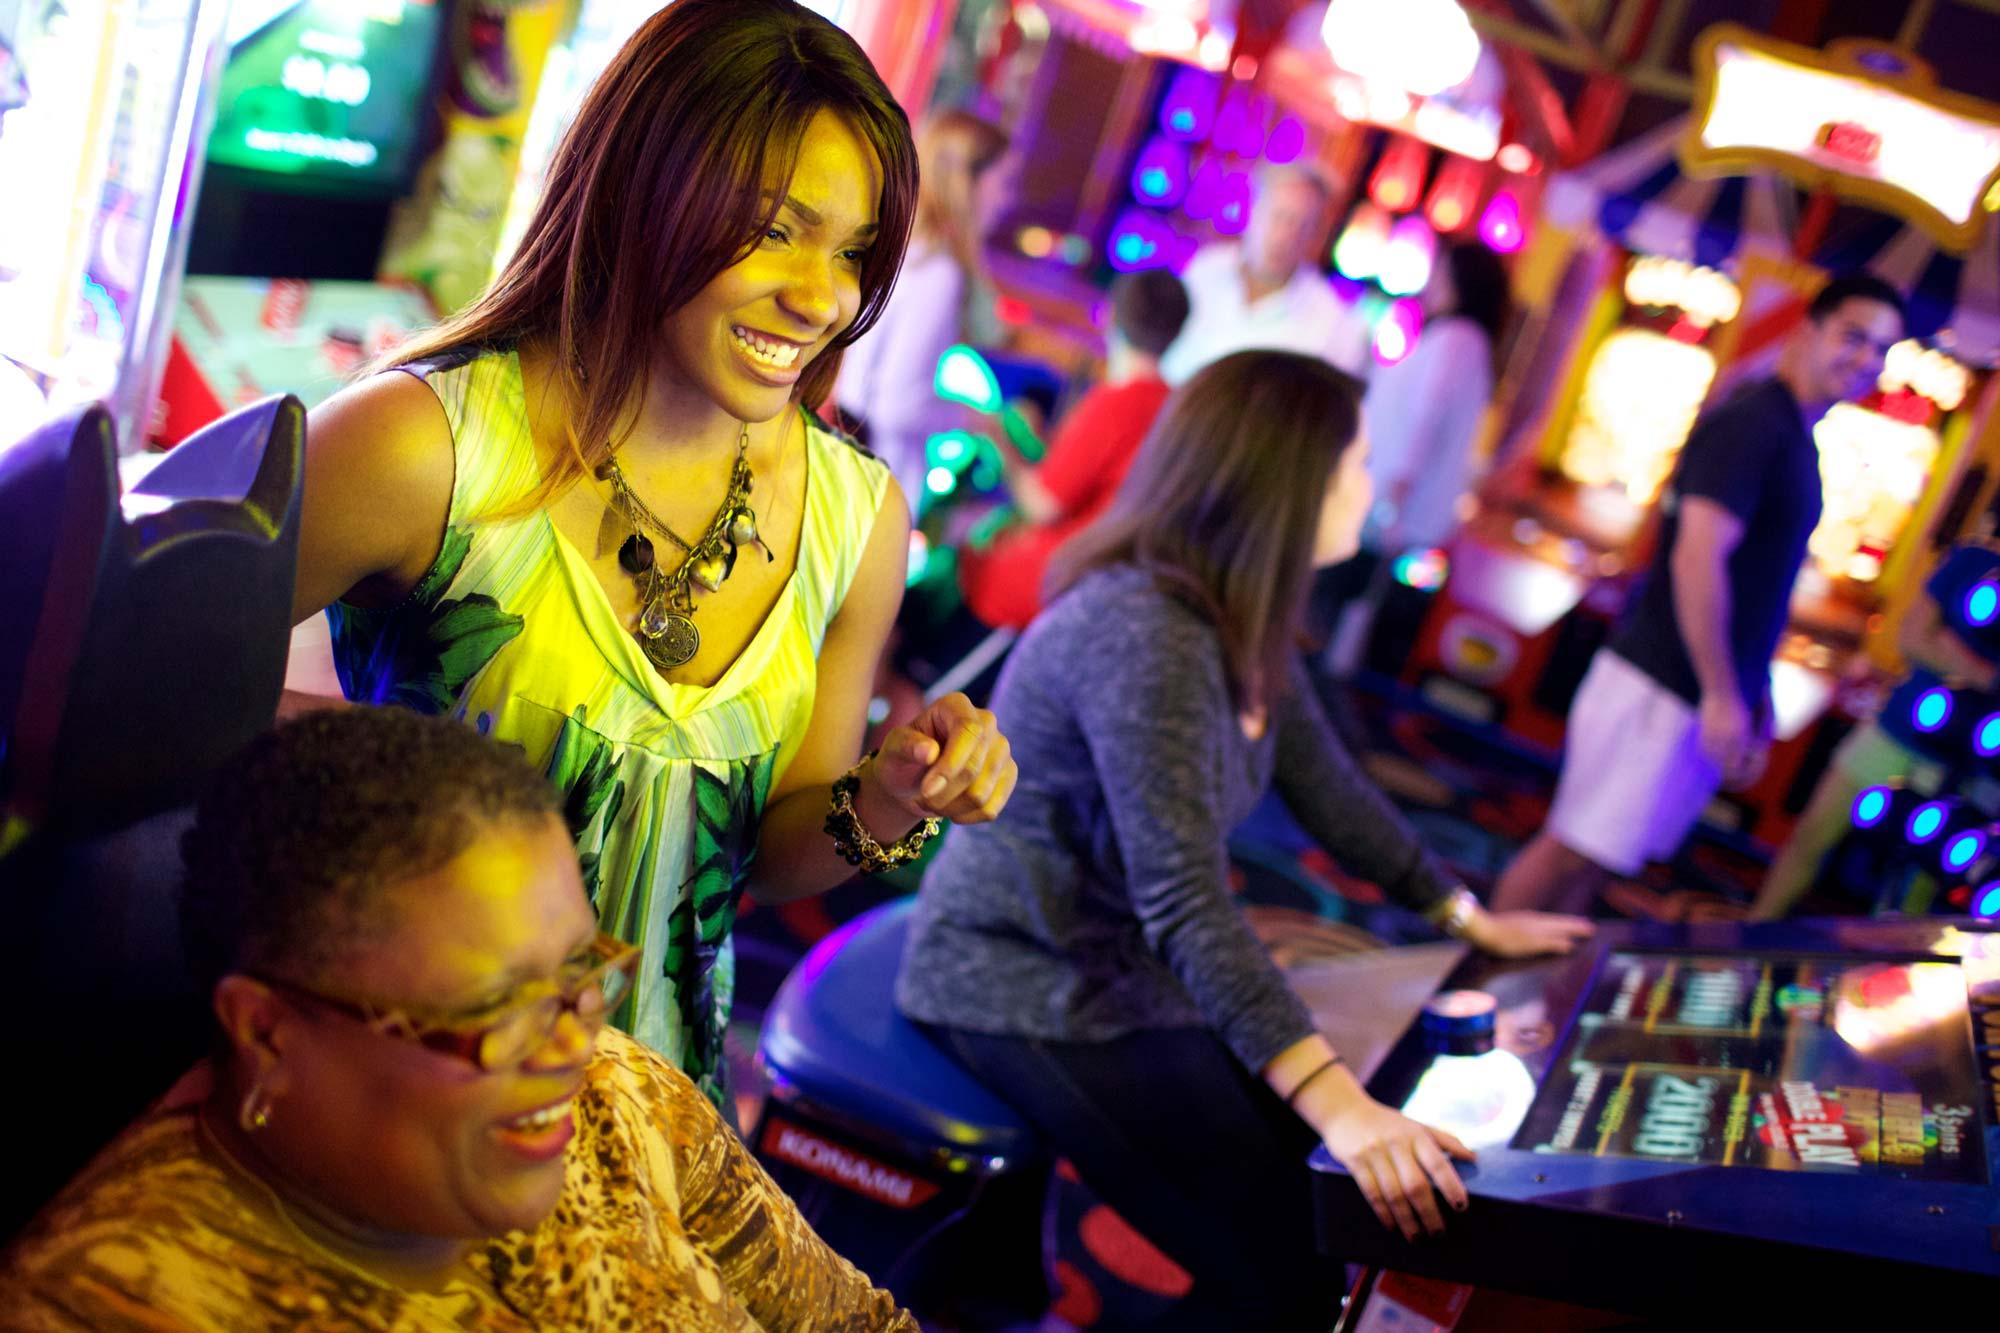 All Age Fun arcade